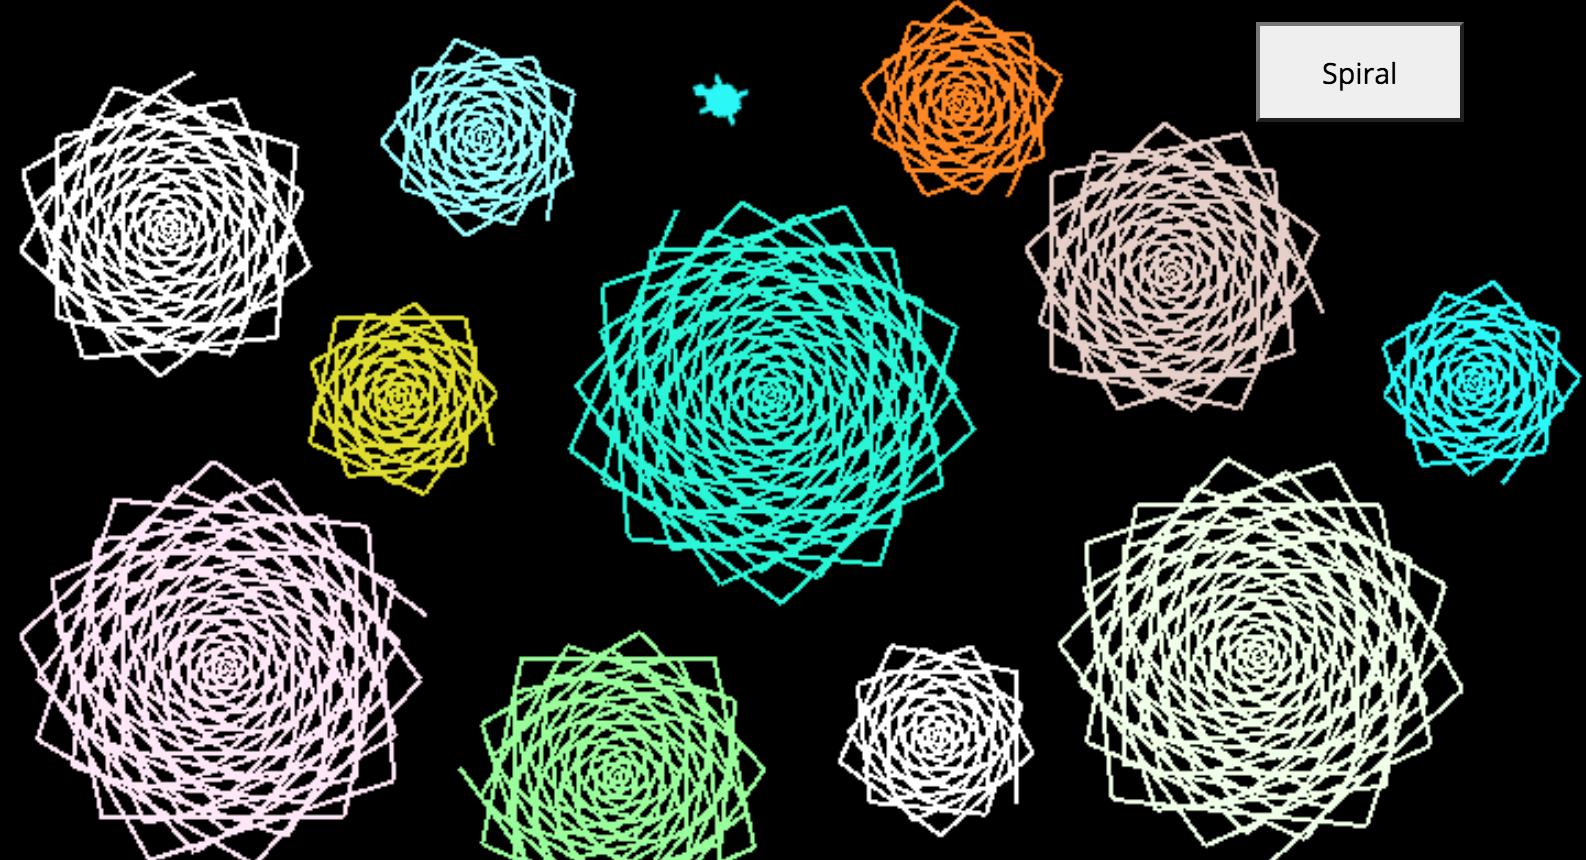 My Lynx Geometric Art